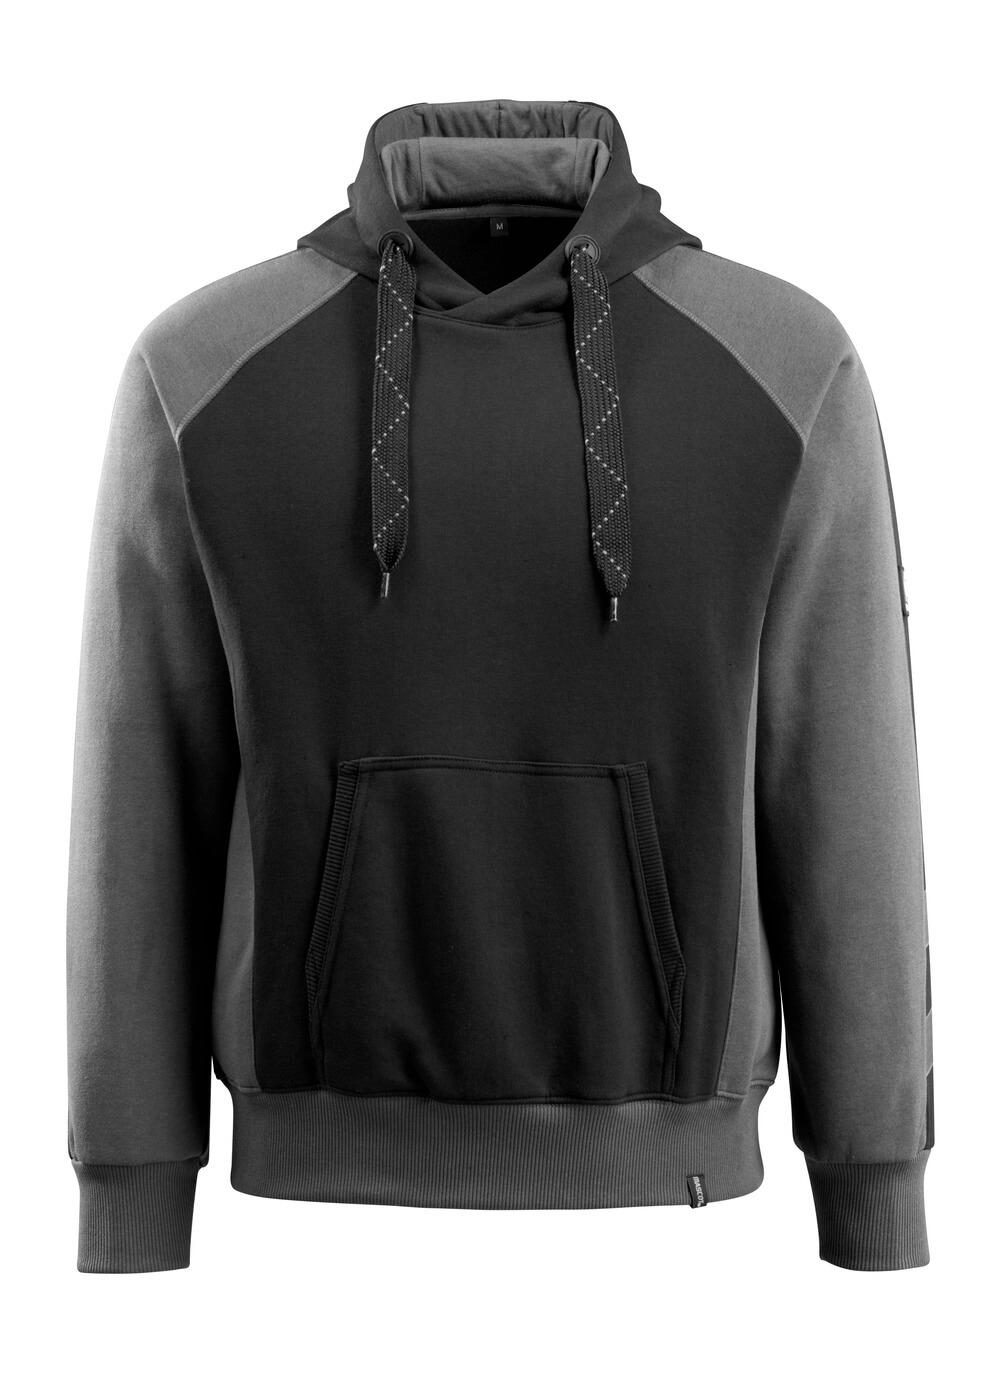 Mascot hoodie